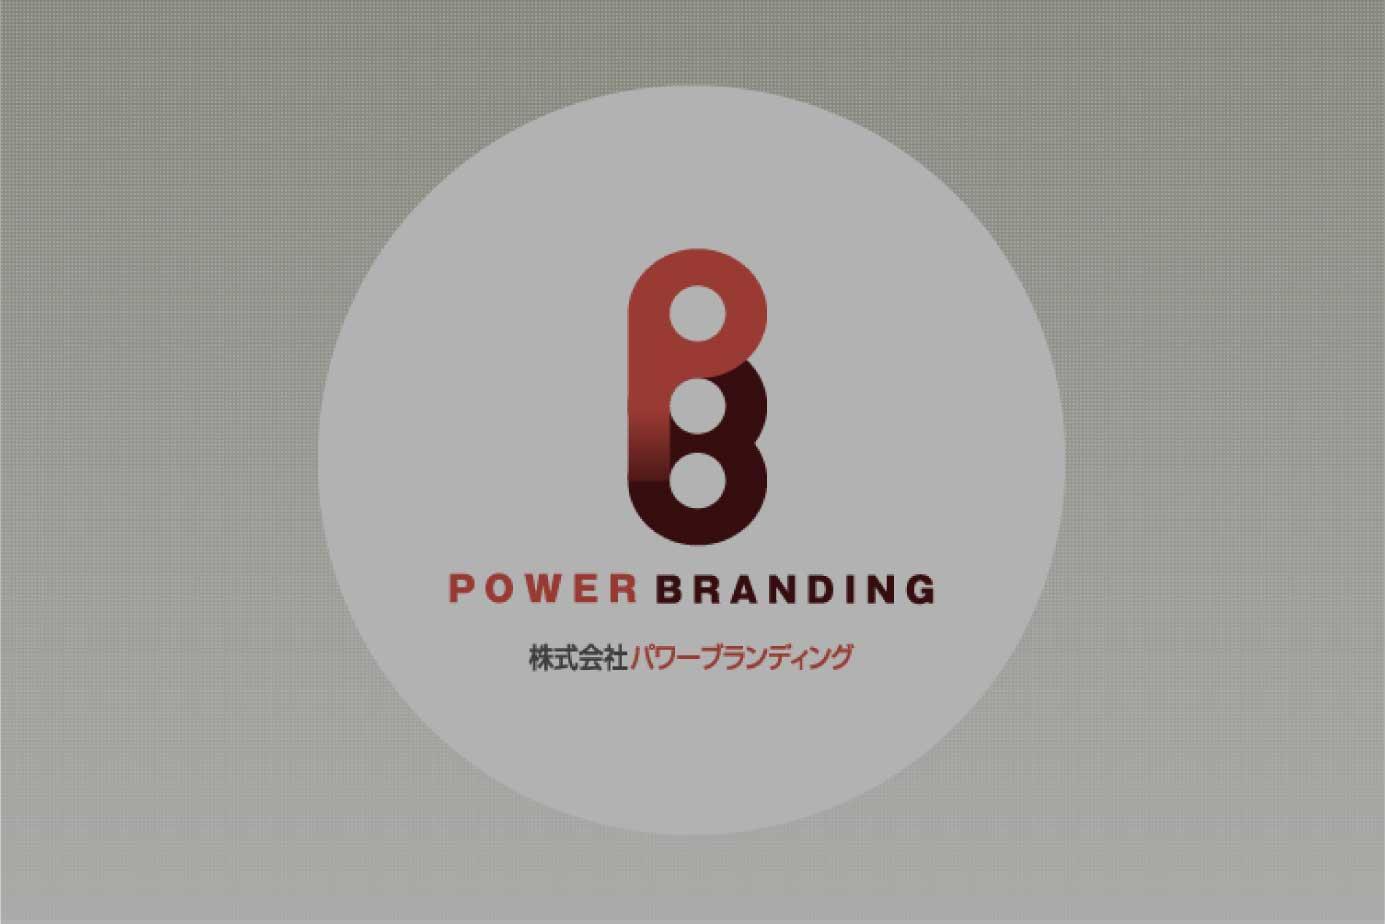 PowerBranding